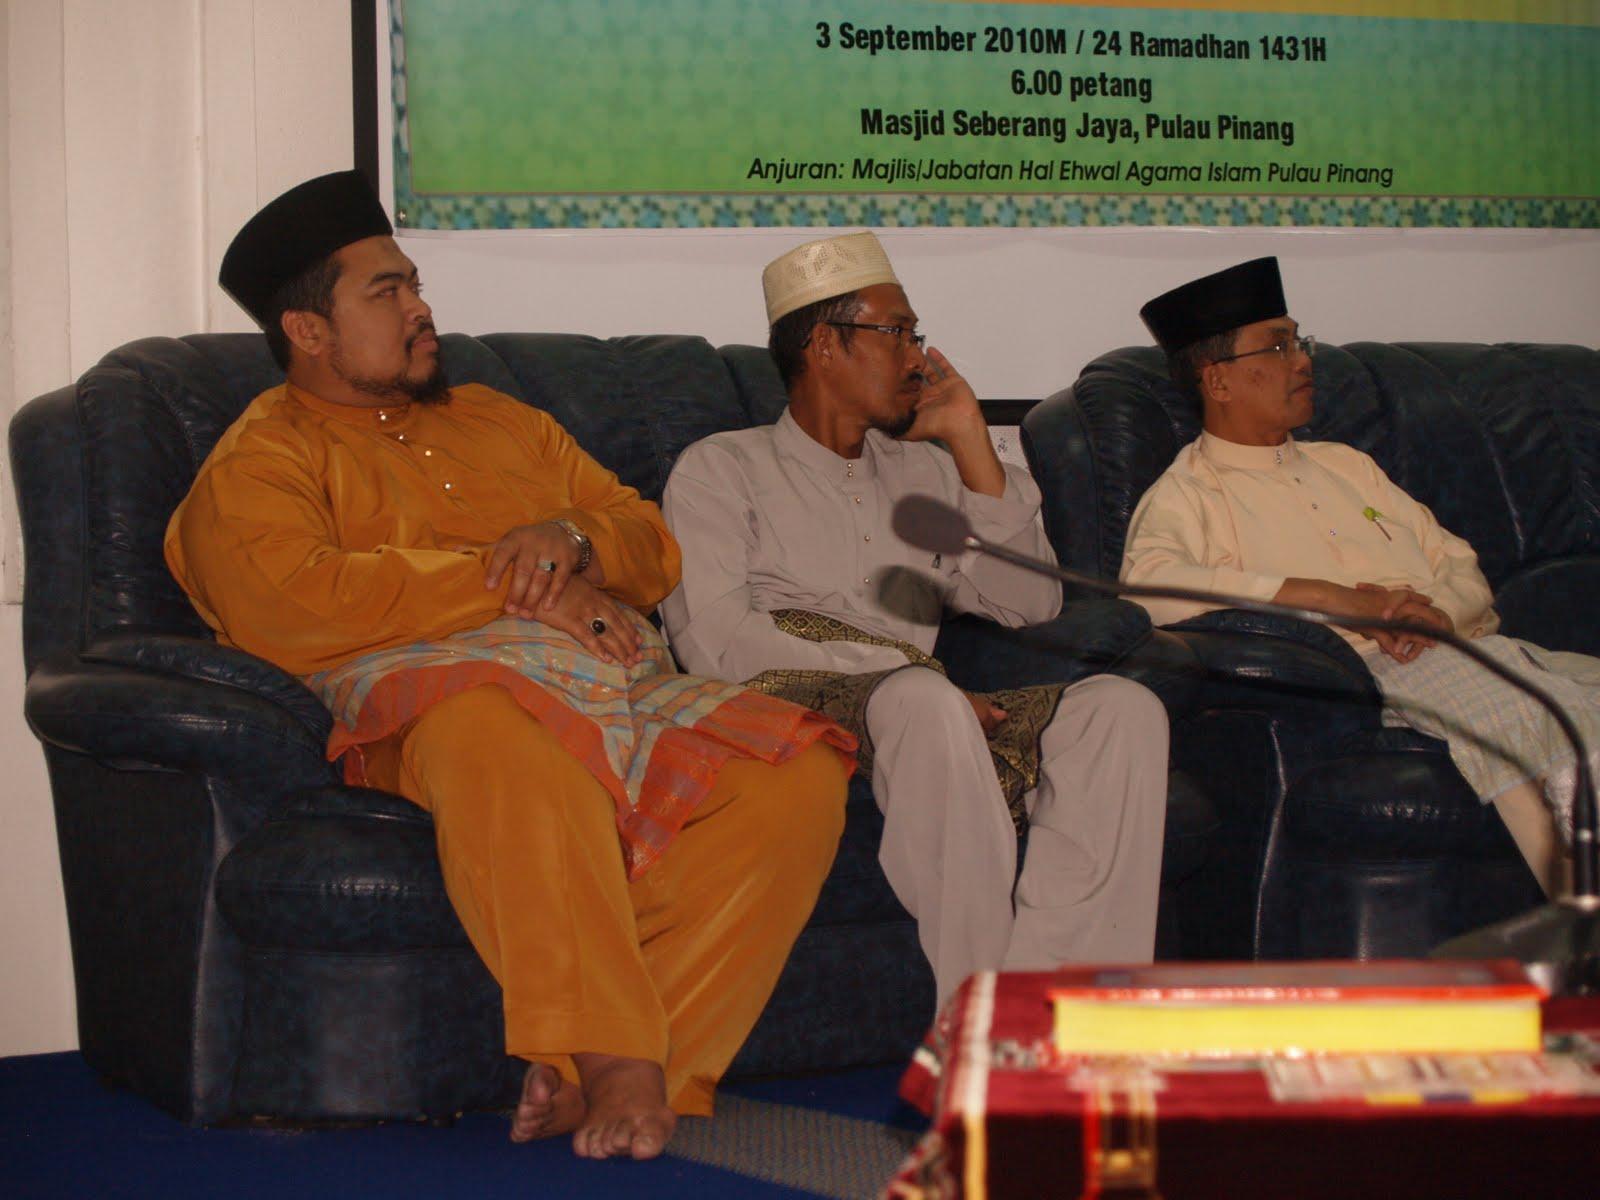 pulau pinang single muslim girls Muslim dating butterworth  muslim matrimonials women dating malaysian location pulau pinang  i'm a muslim woman looking for a good man in which to .